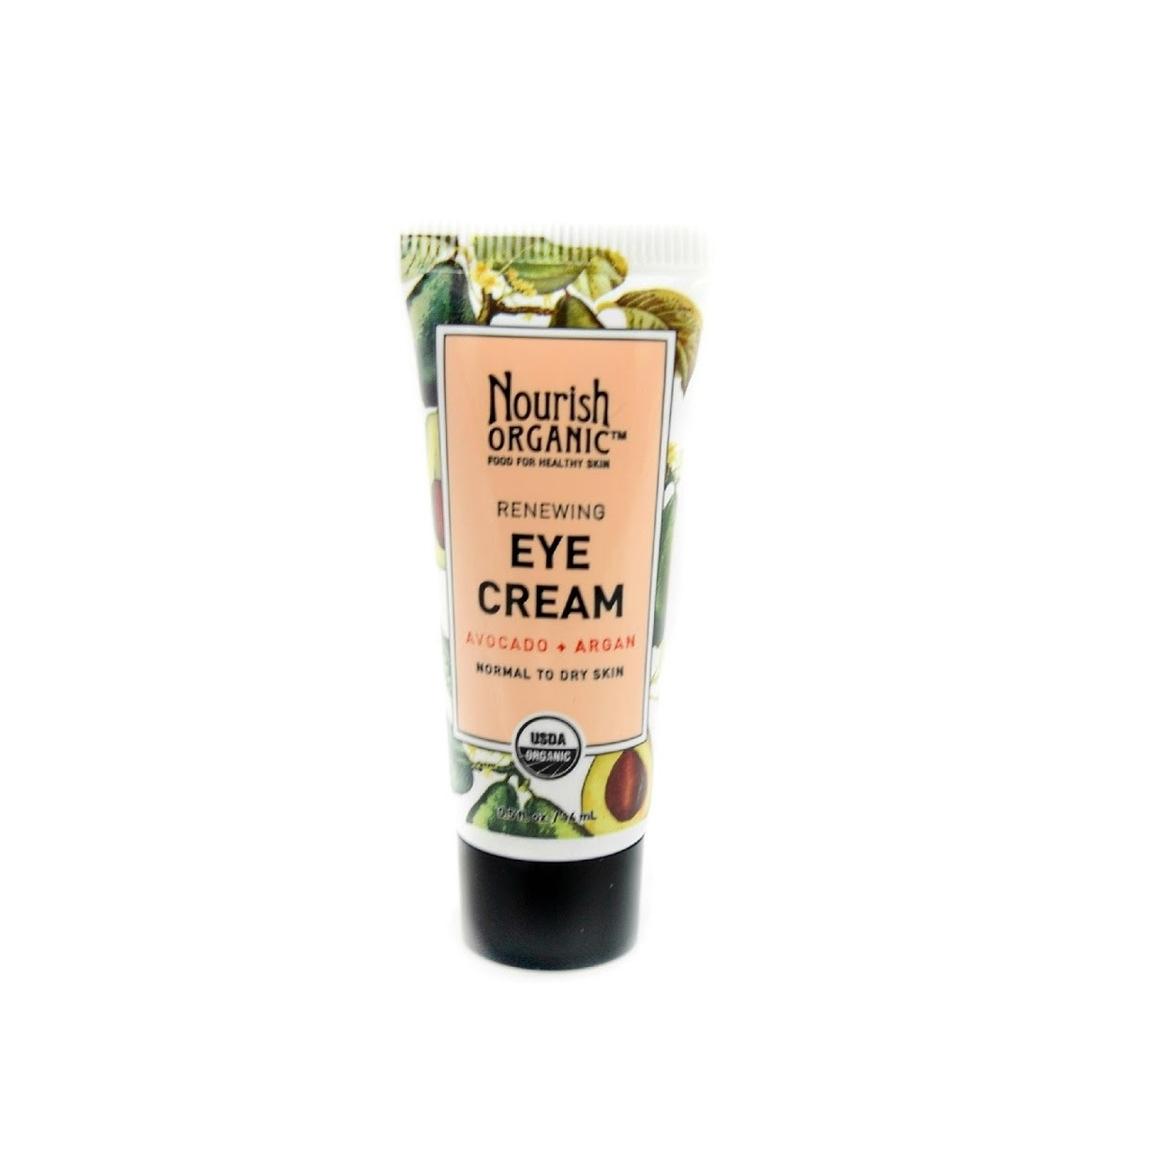 Nourish Organic Eye Cream Edit 2.jpg